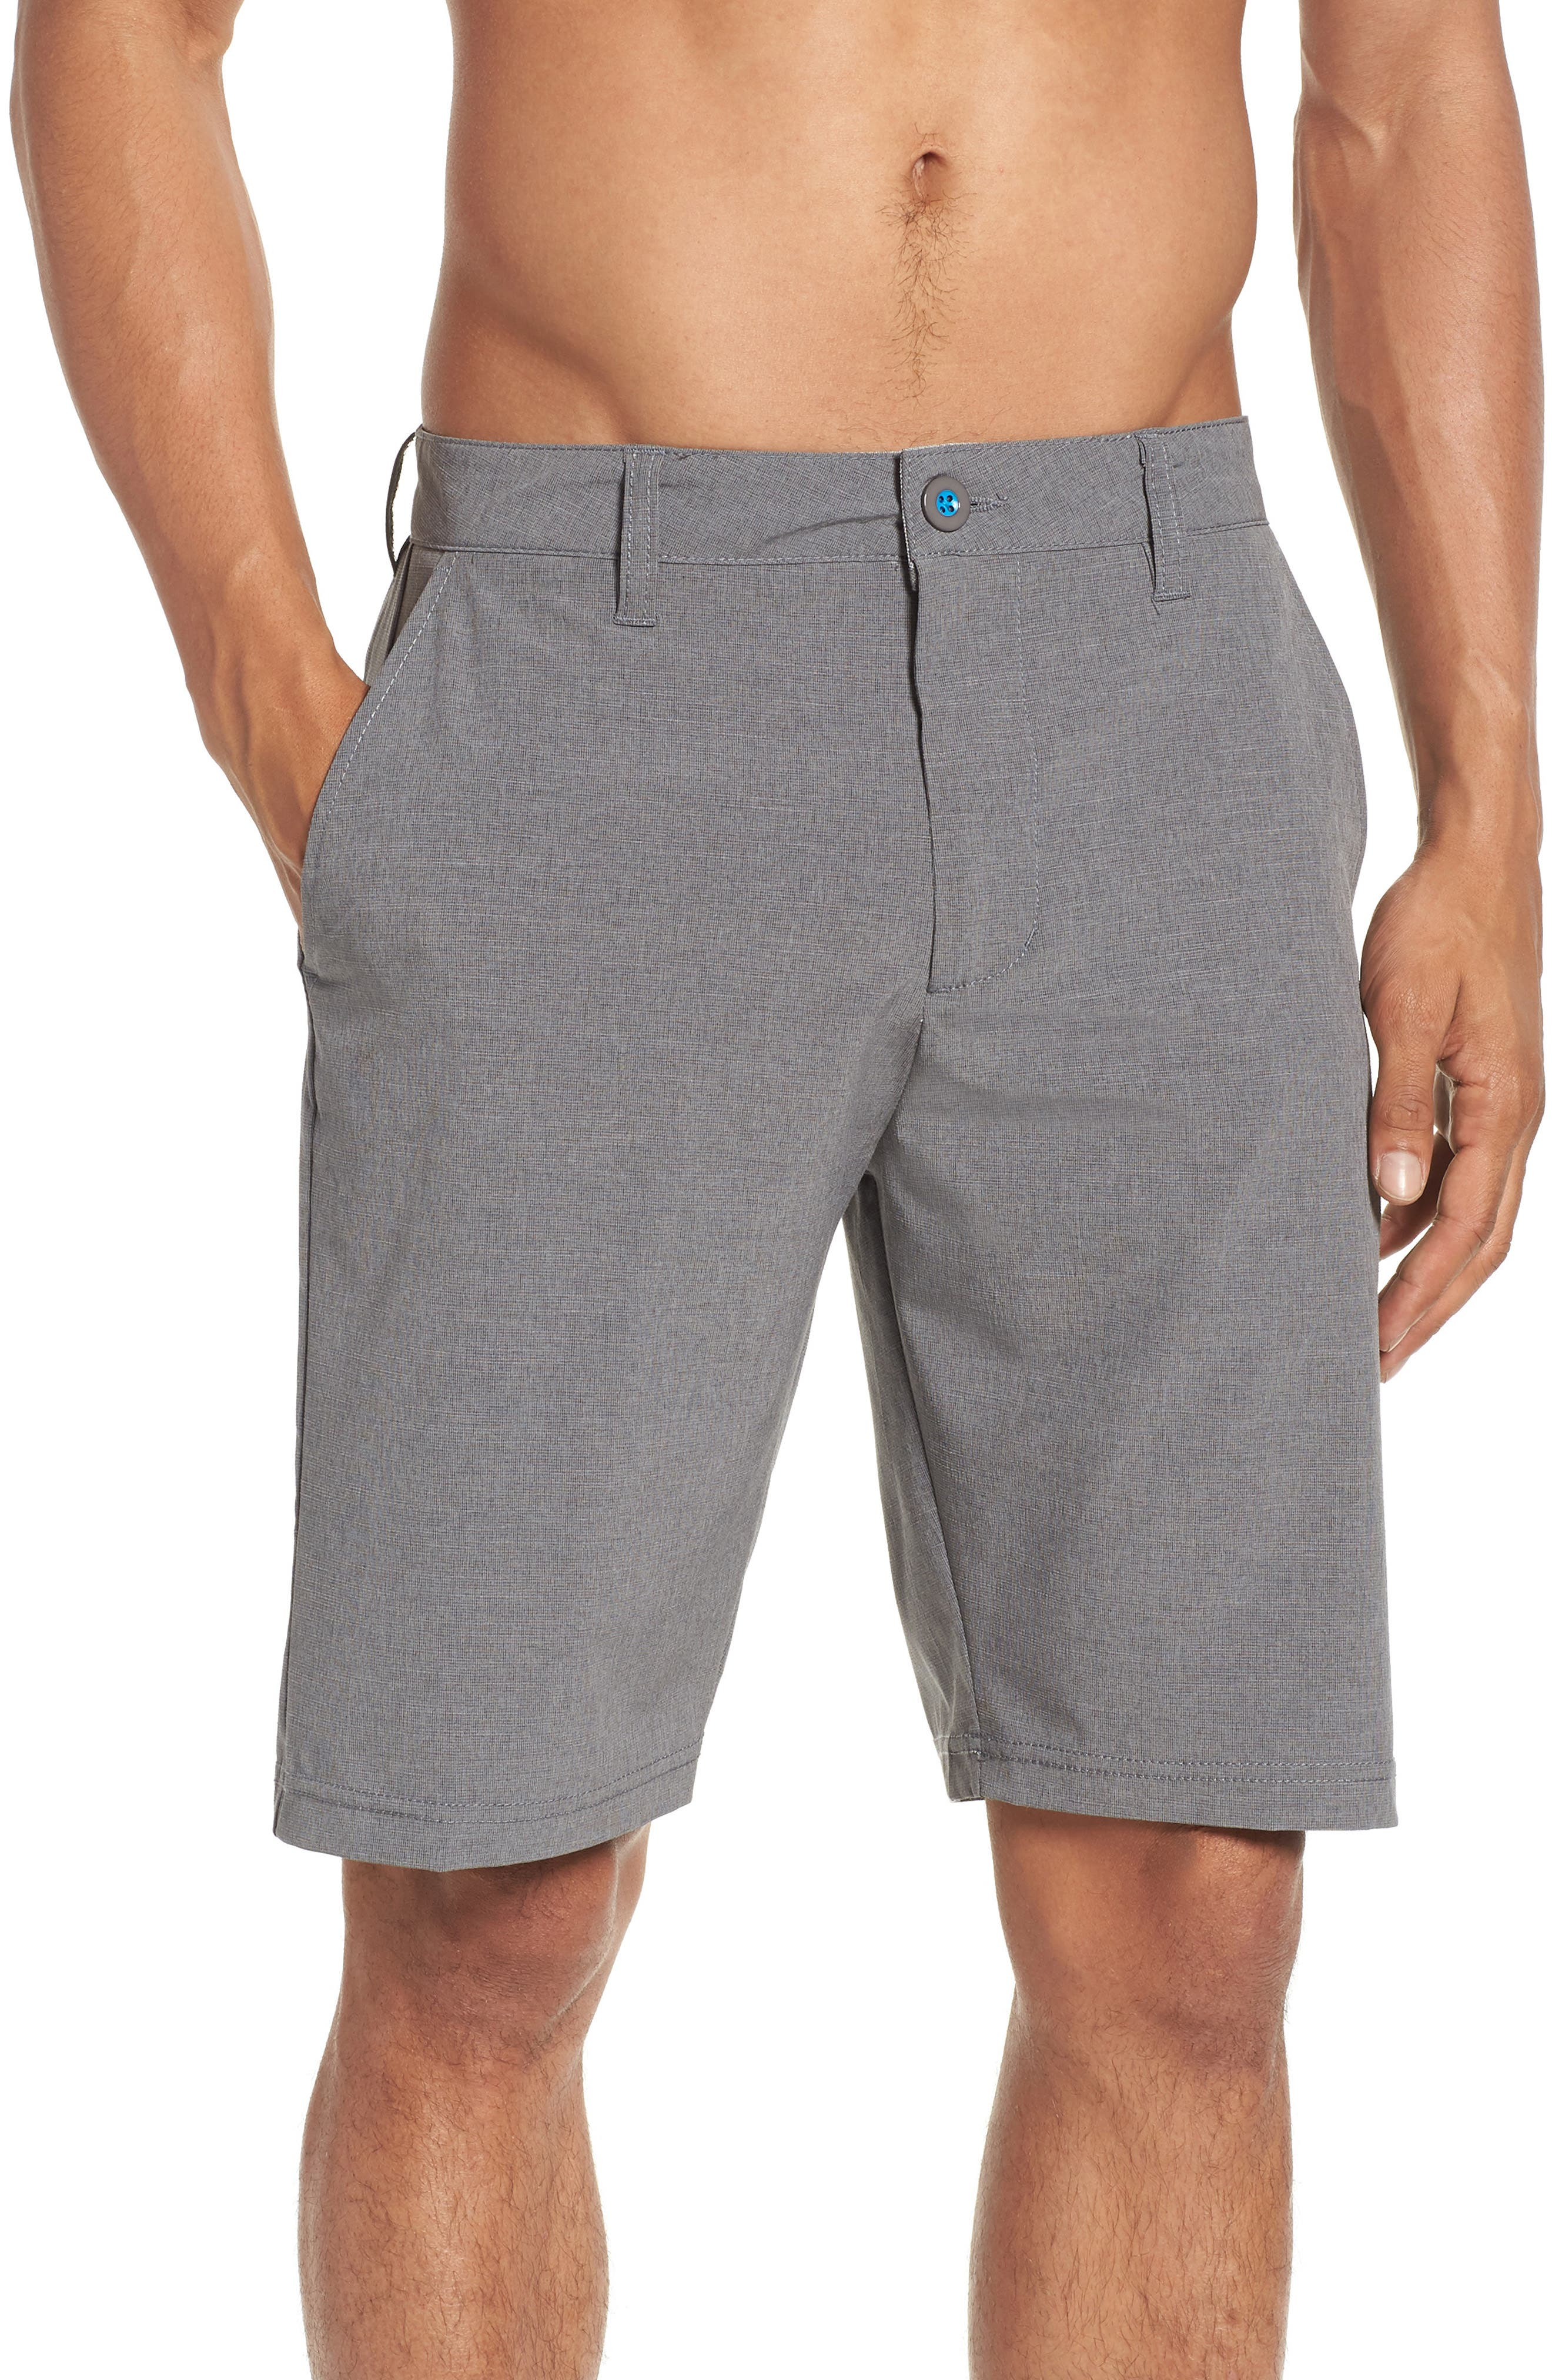 Cruiser Hybrid Shorts,                             Alternate thumbnail 4, color,                             CHARCOAL